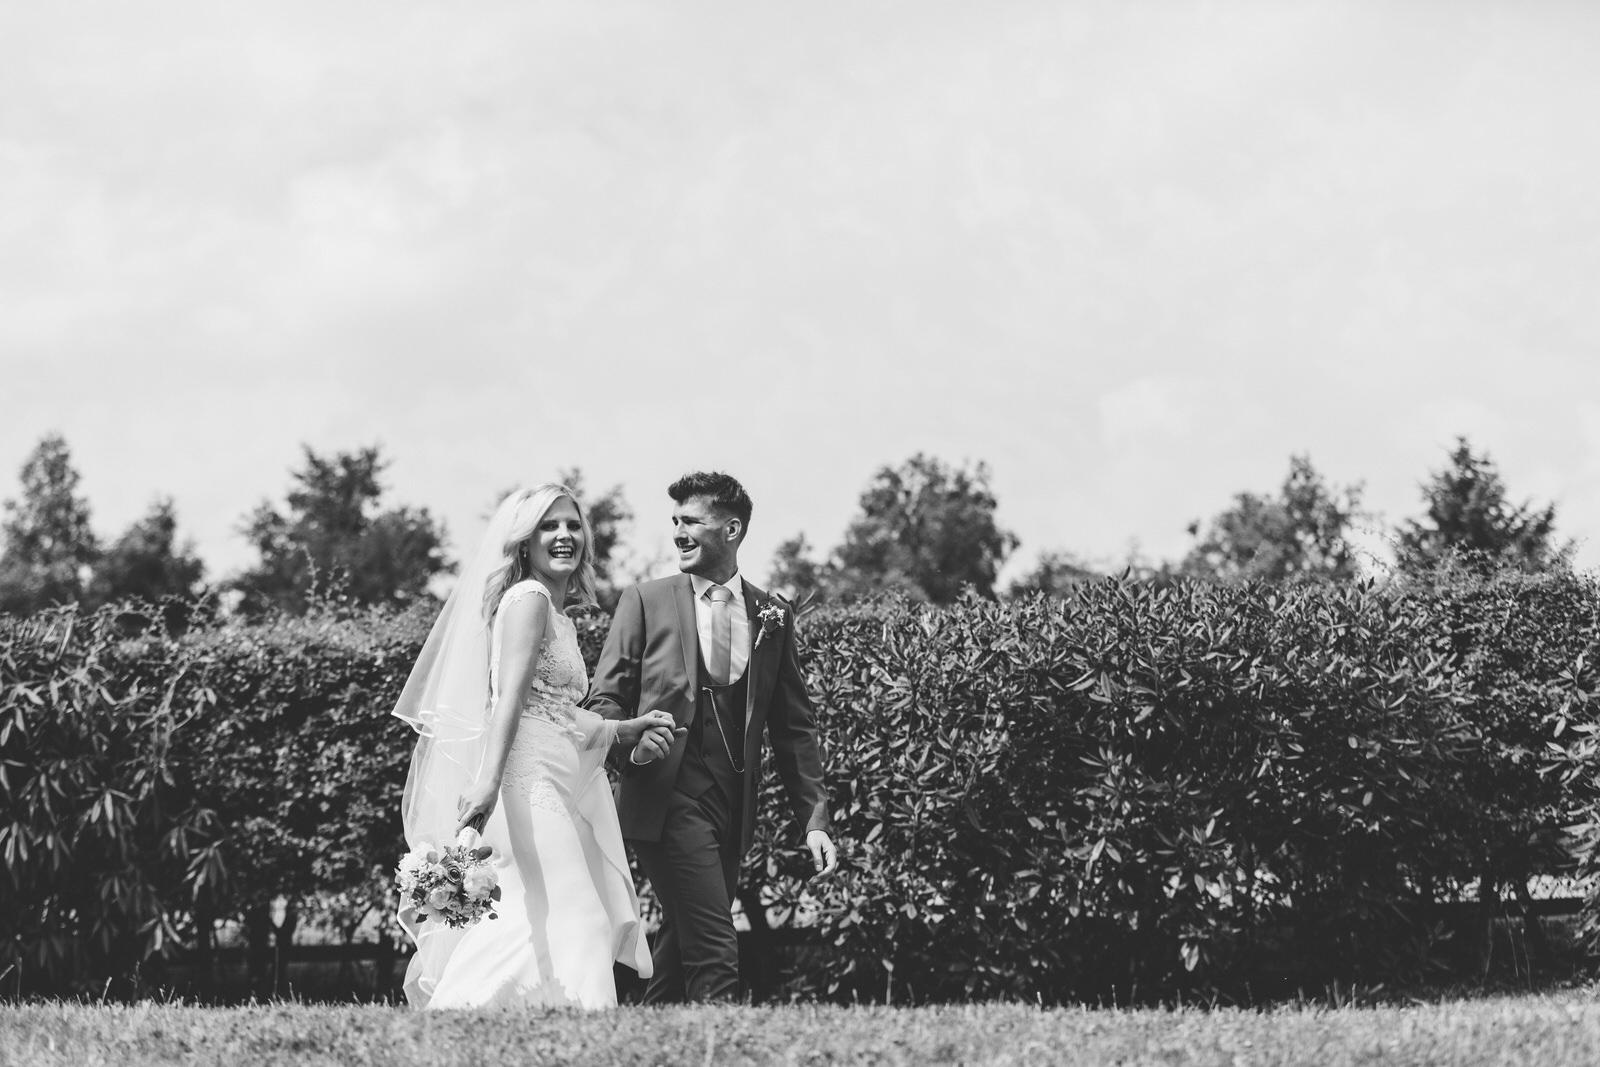 Moddershall-Oaks-Spa-Wedding-Photographer-044.jpg